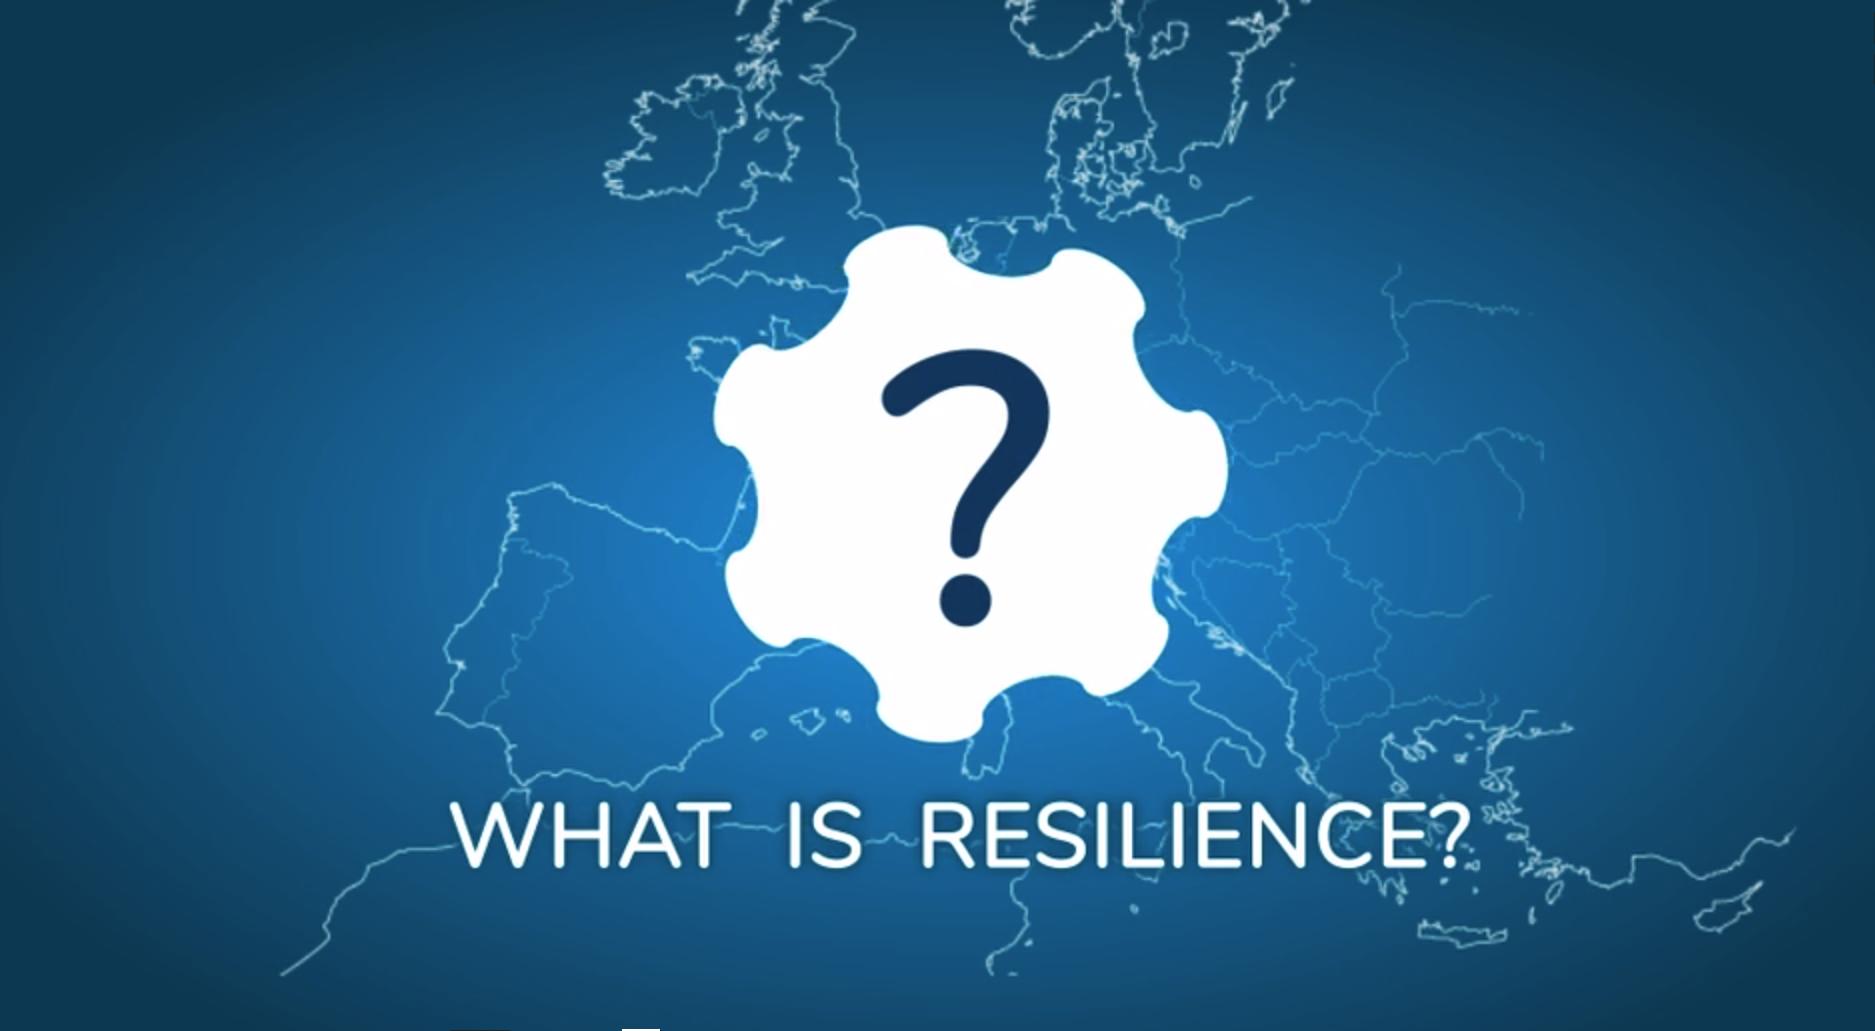 resilience  u2013 part 1  u2013 what is resilience  u2013 future